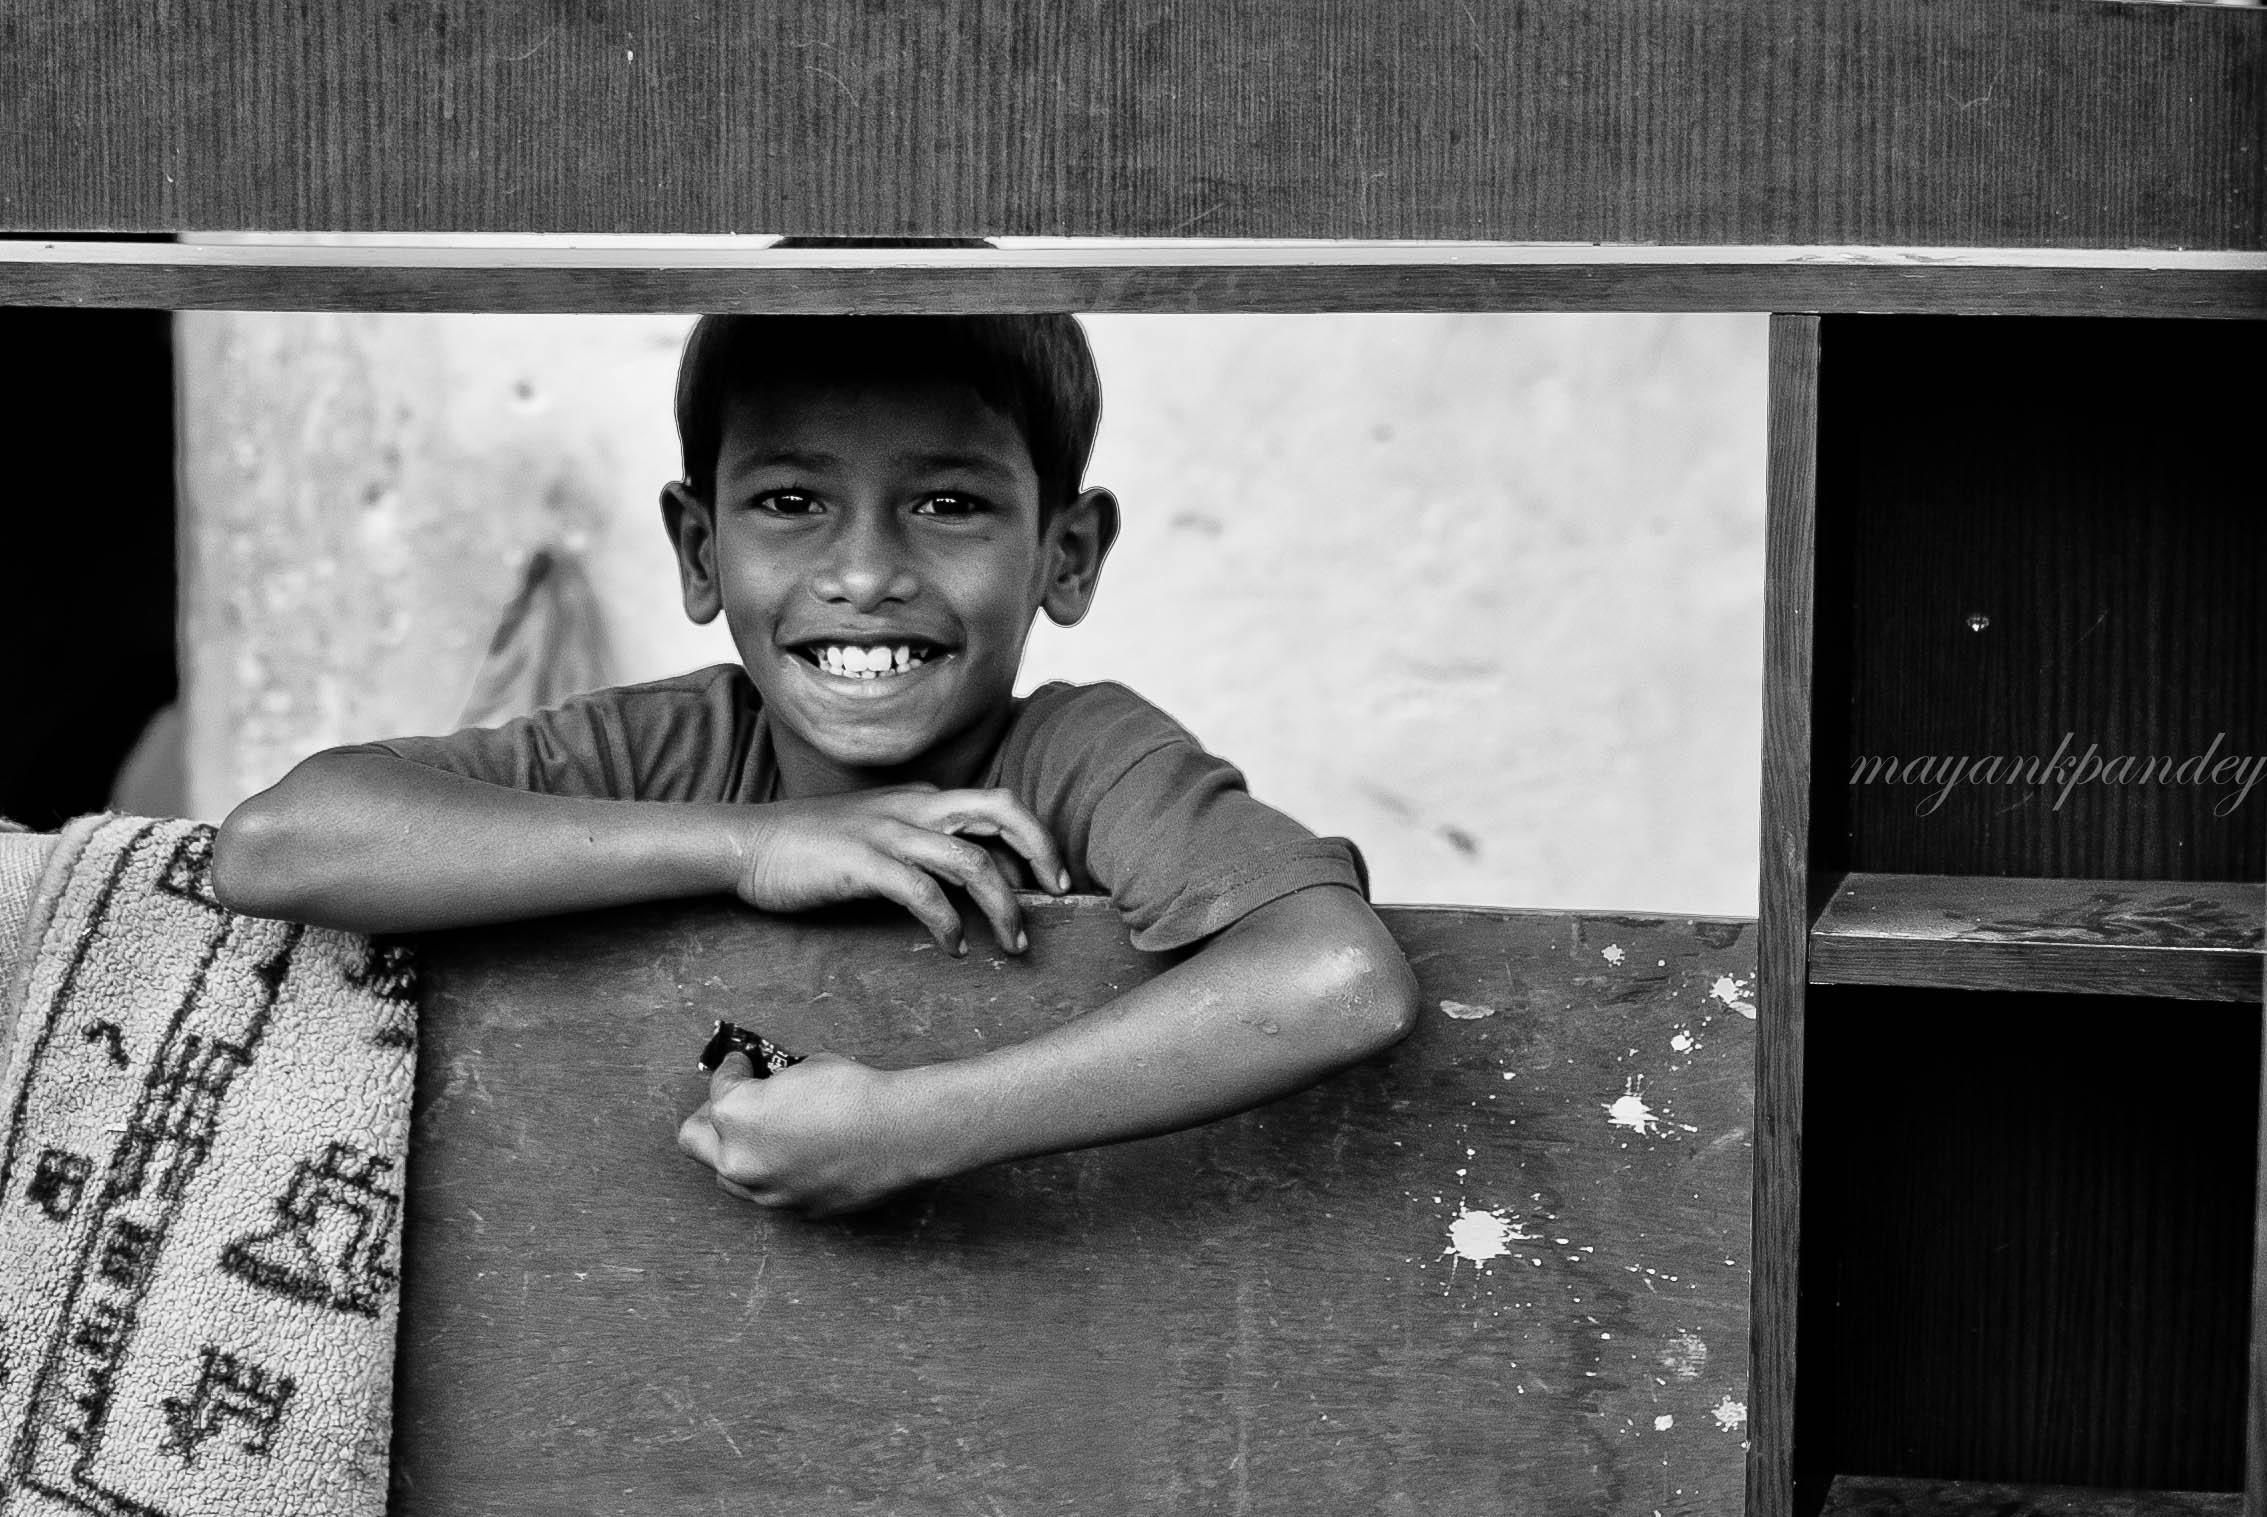 Smile - Mayank Pandey amateur photographer from Mumbai India online photo exhibition street [hotography black and white Маянк Пандей фотограф любитель из Мумбай Индия онлайн фотовыставка стрит фотография черно белый